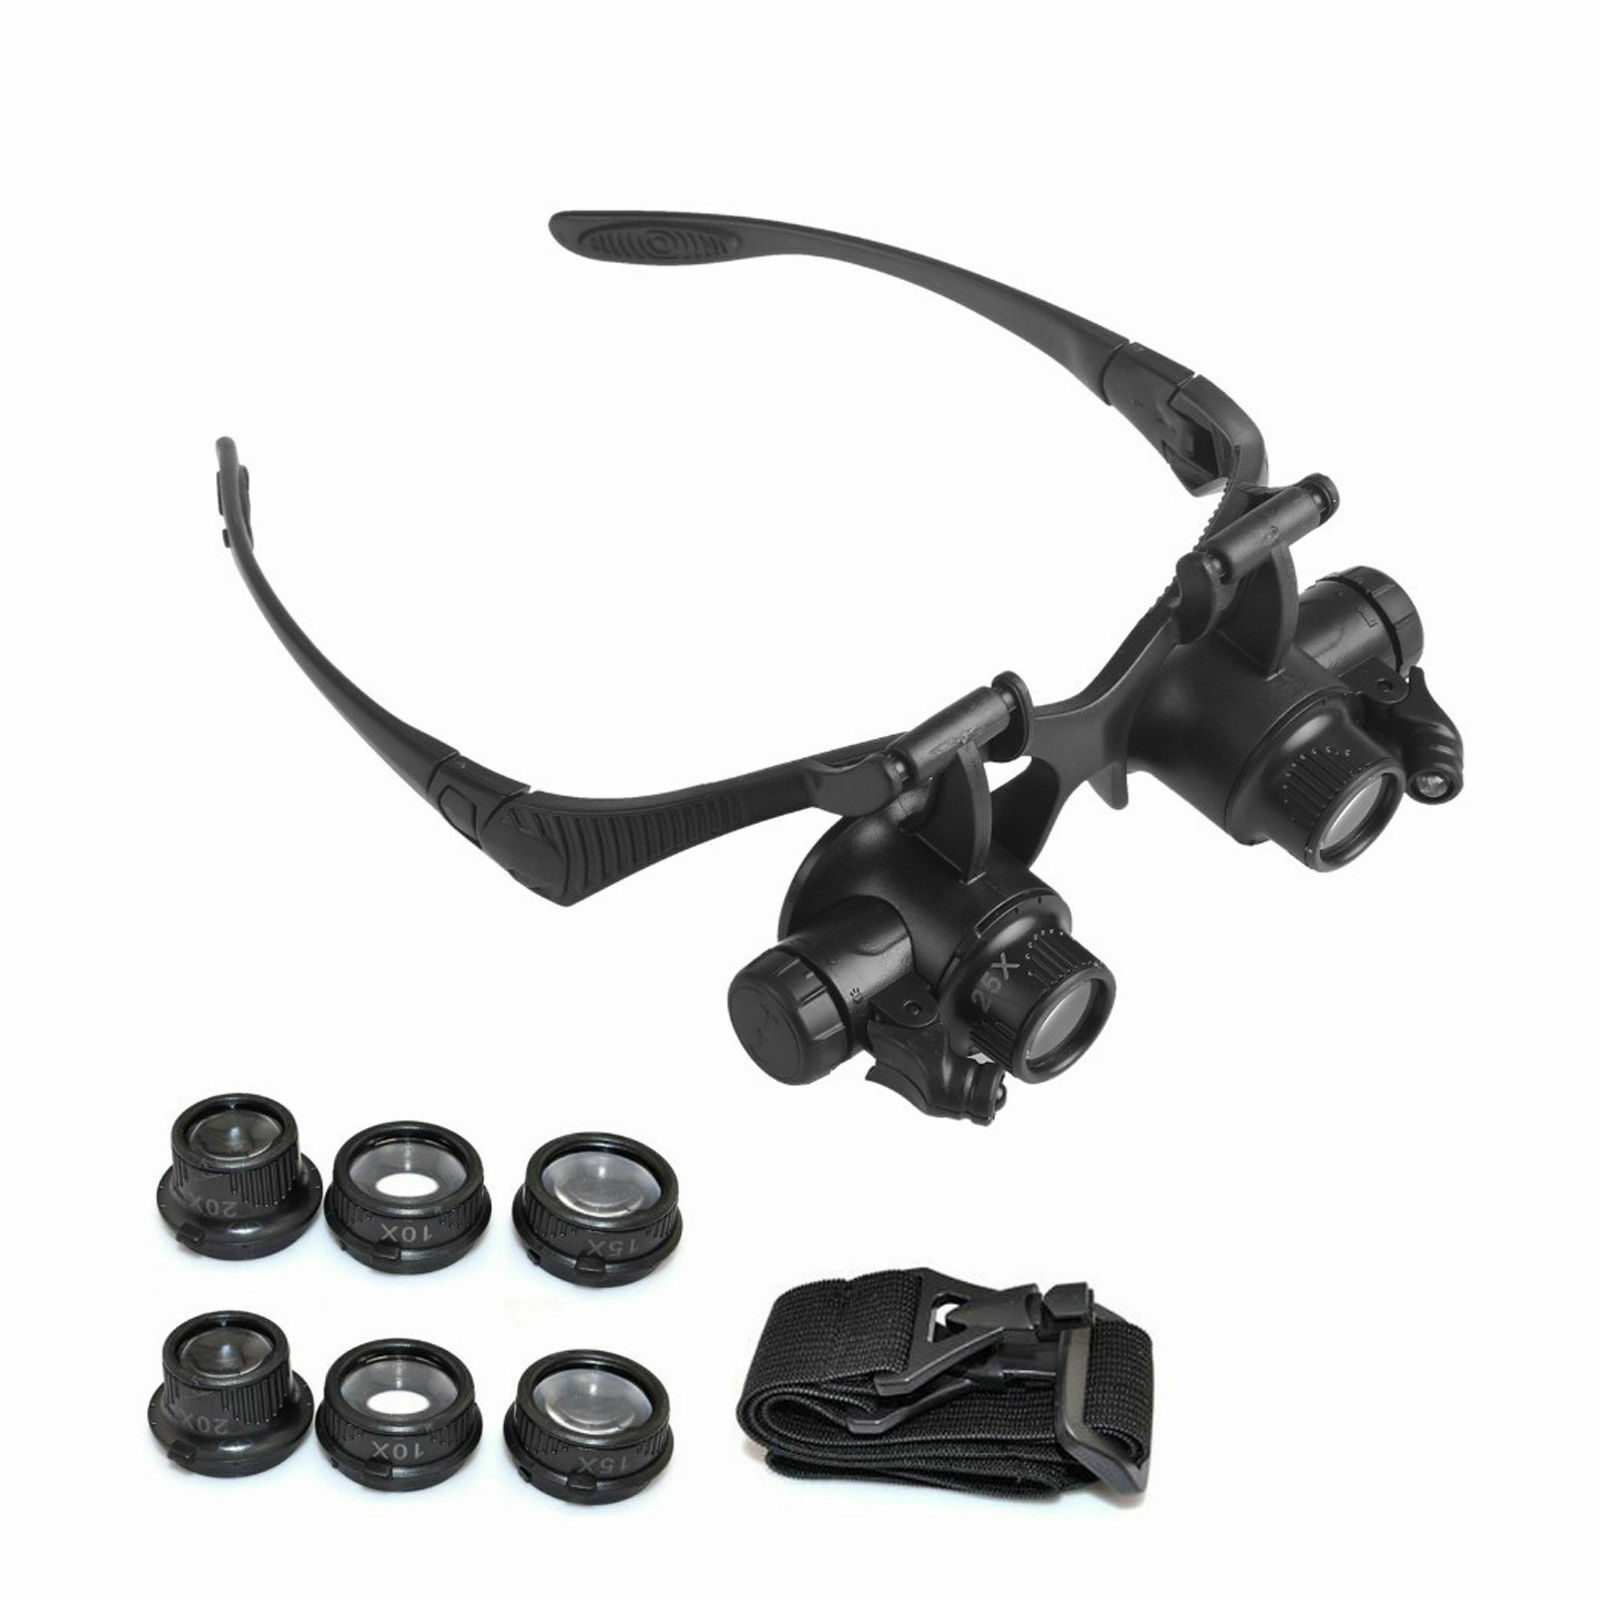 Brillenlupe Lupenbrille Kopflupe Juwelier Uhrmacher LED Lupe 10X 15X 20X 25X